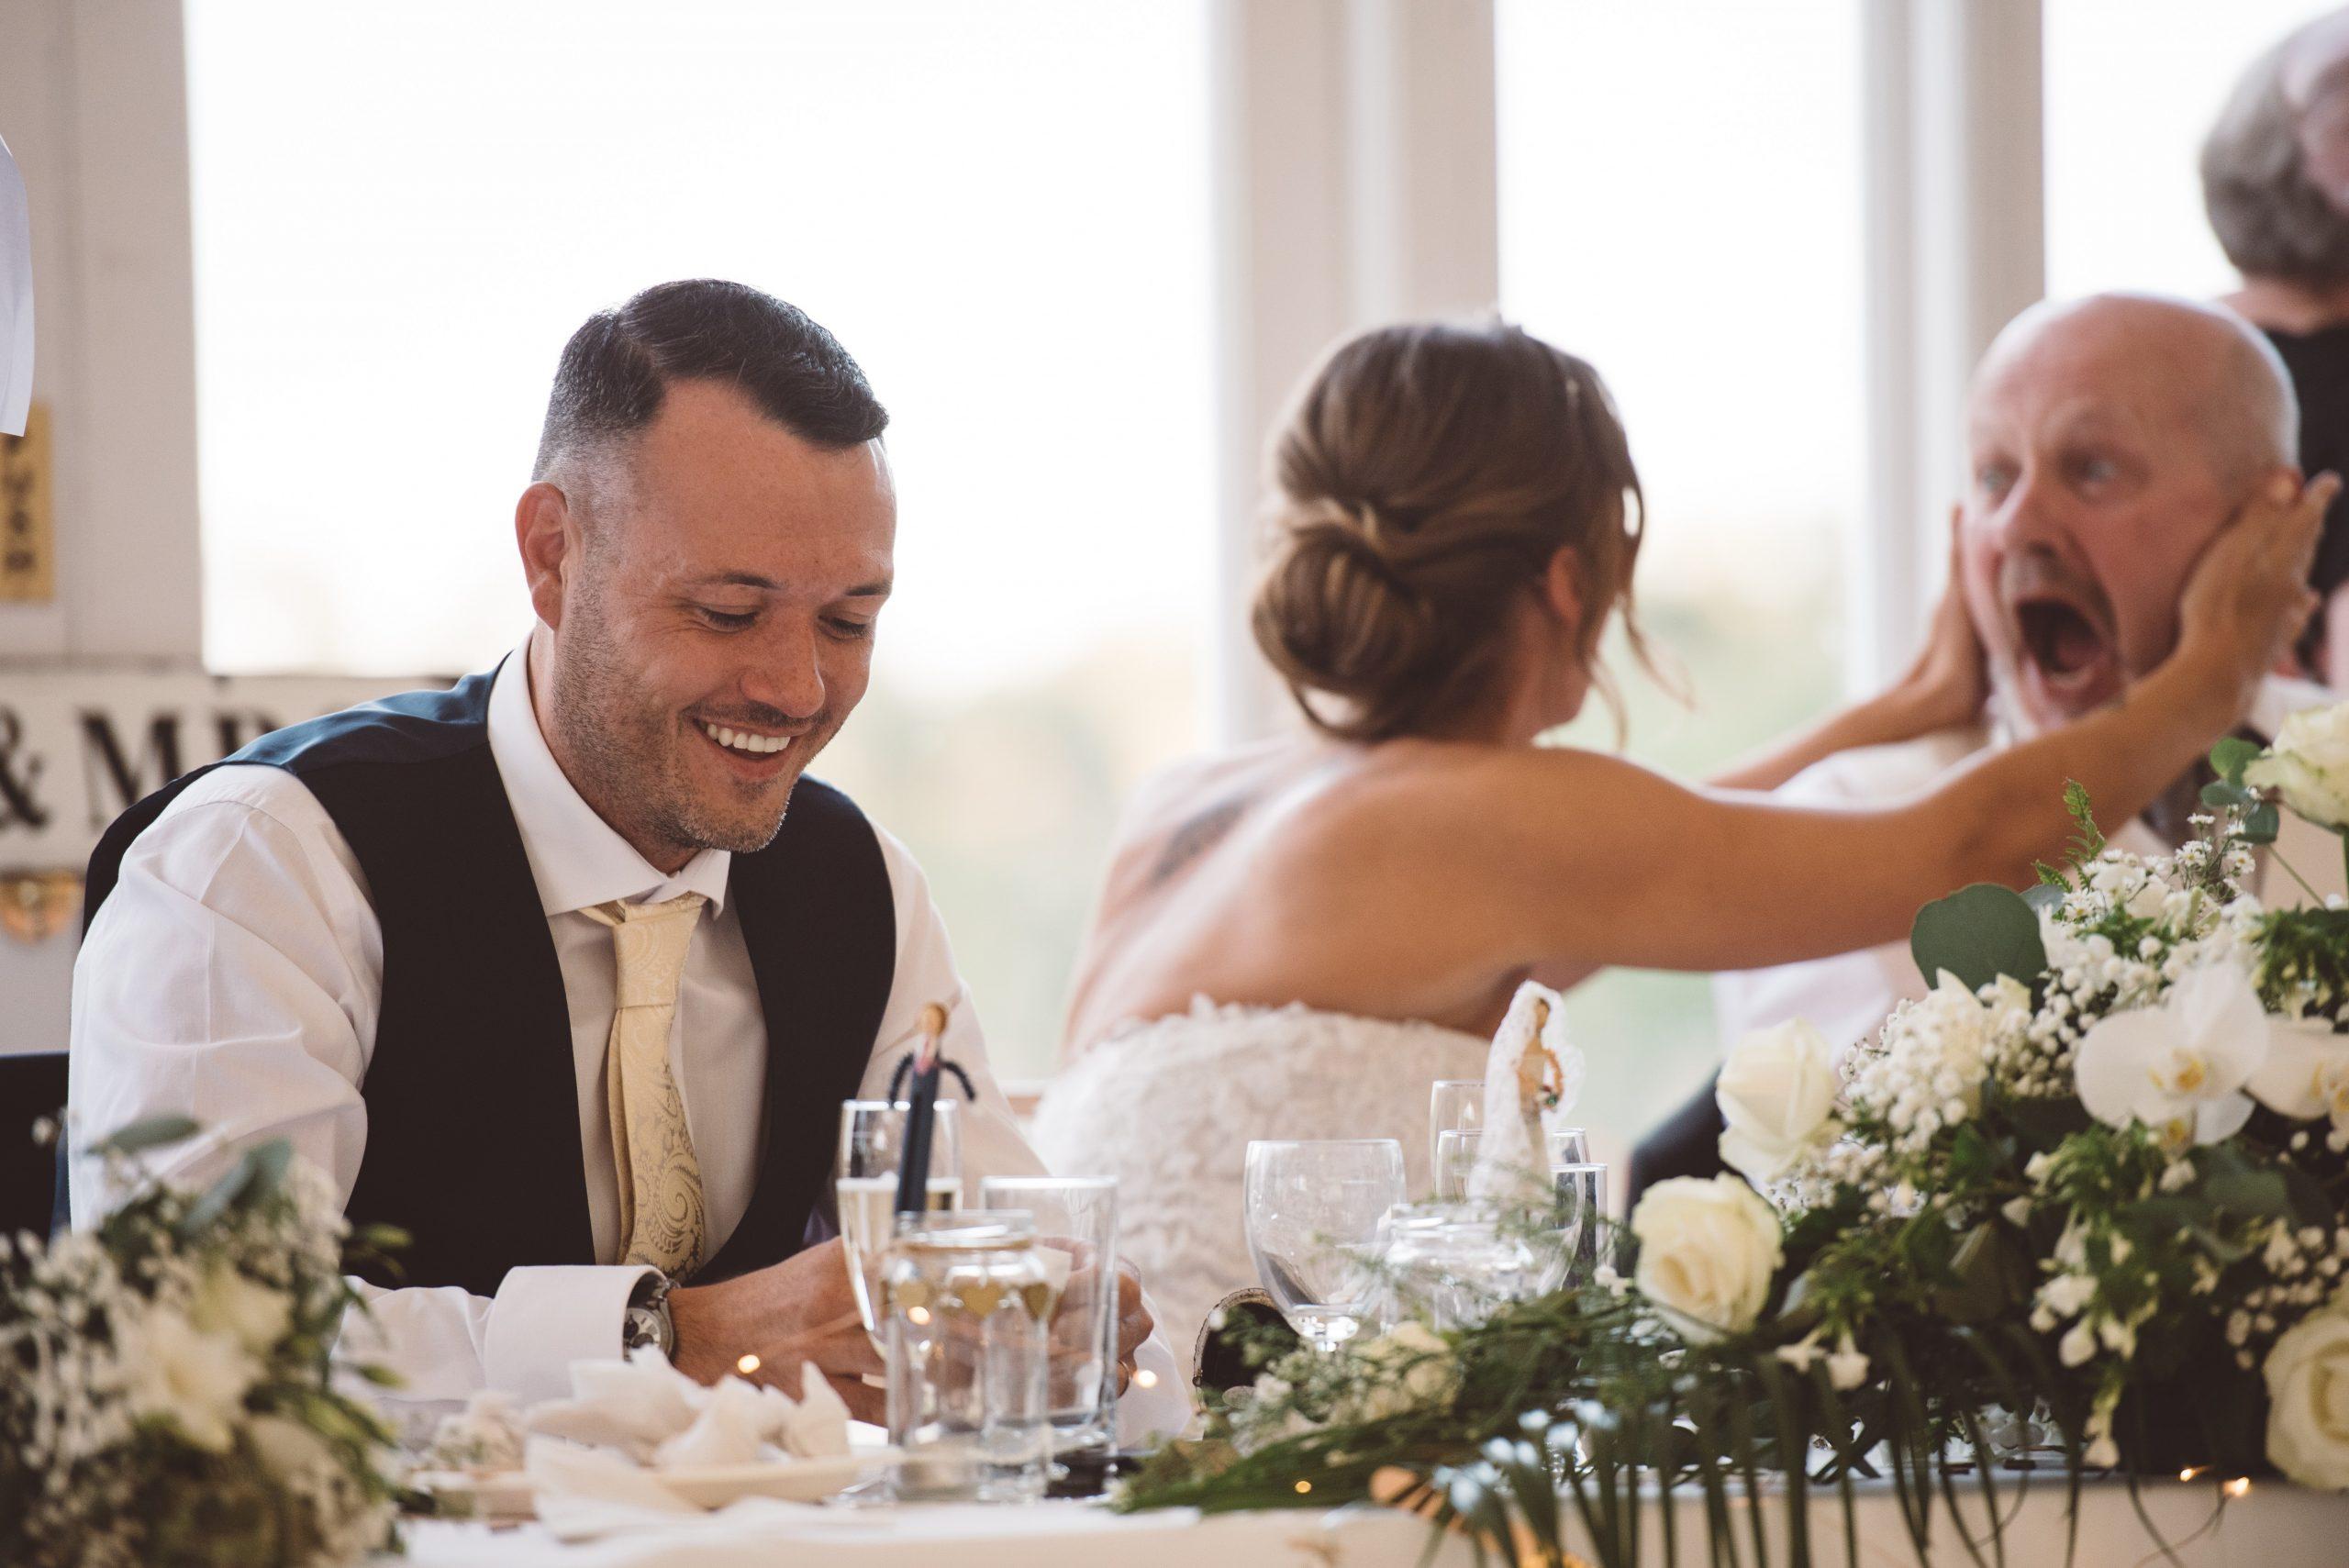 wedding speeches at Keythorpe Manor